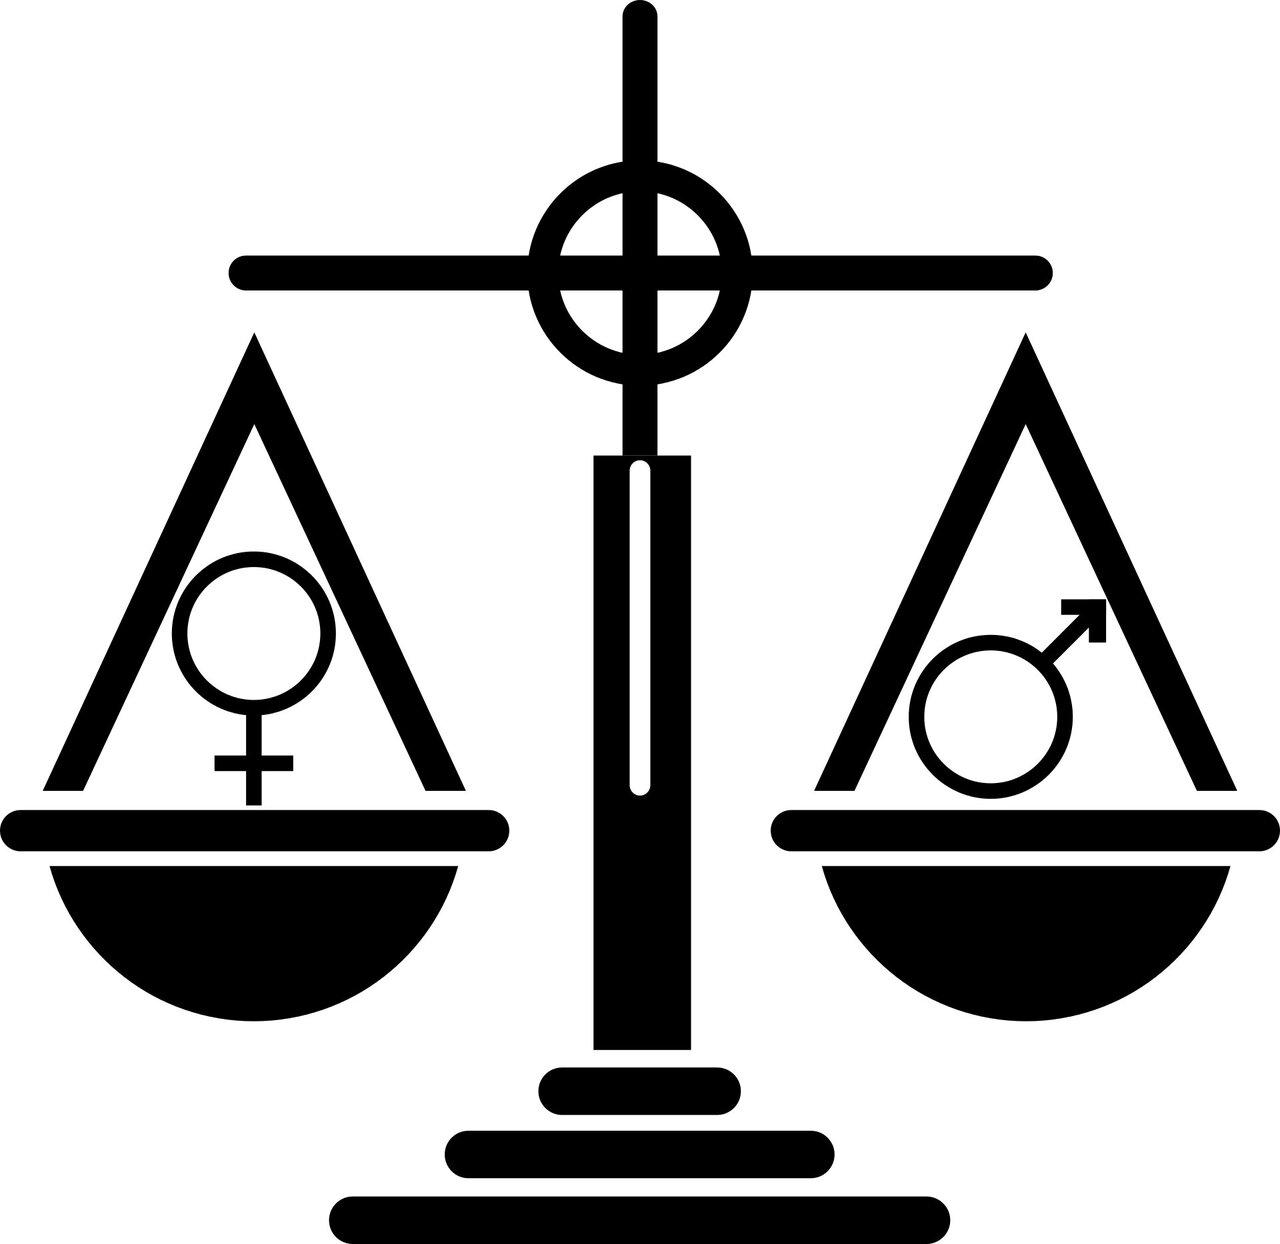 Hiring committees that don't believe in gender bias promote fewer women